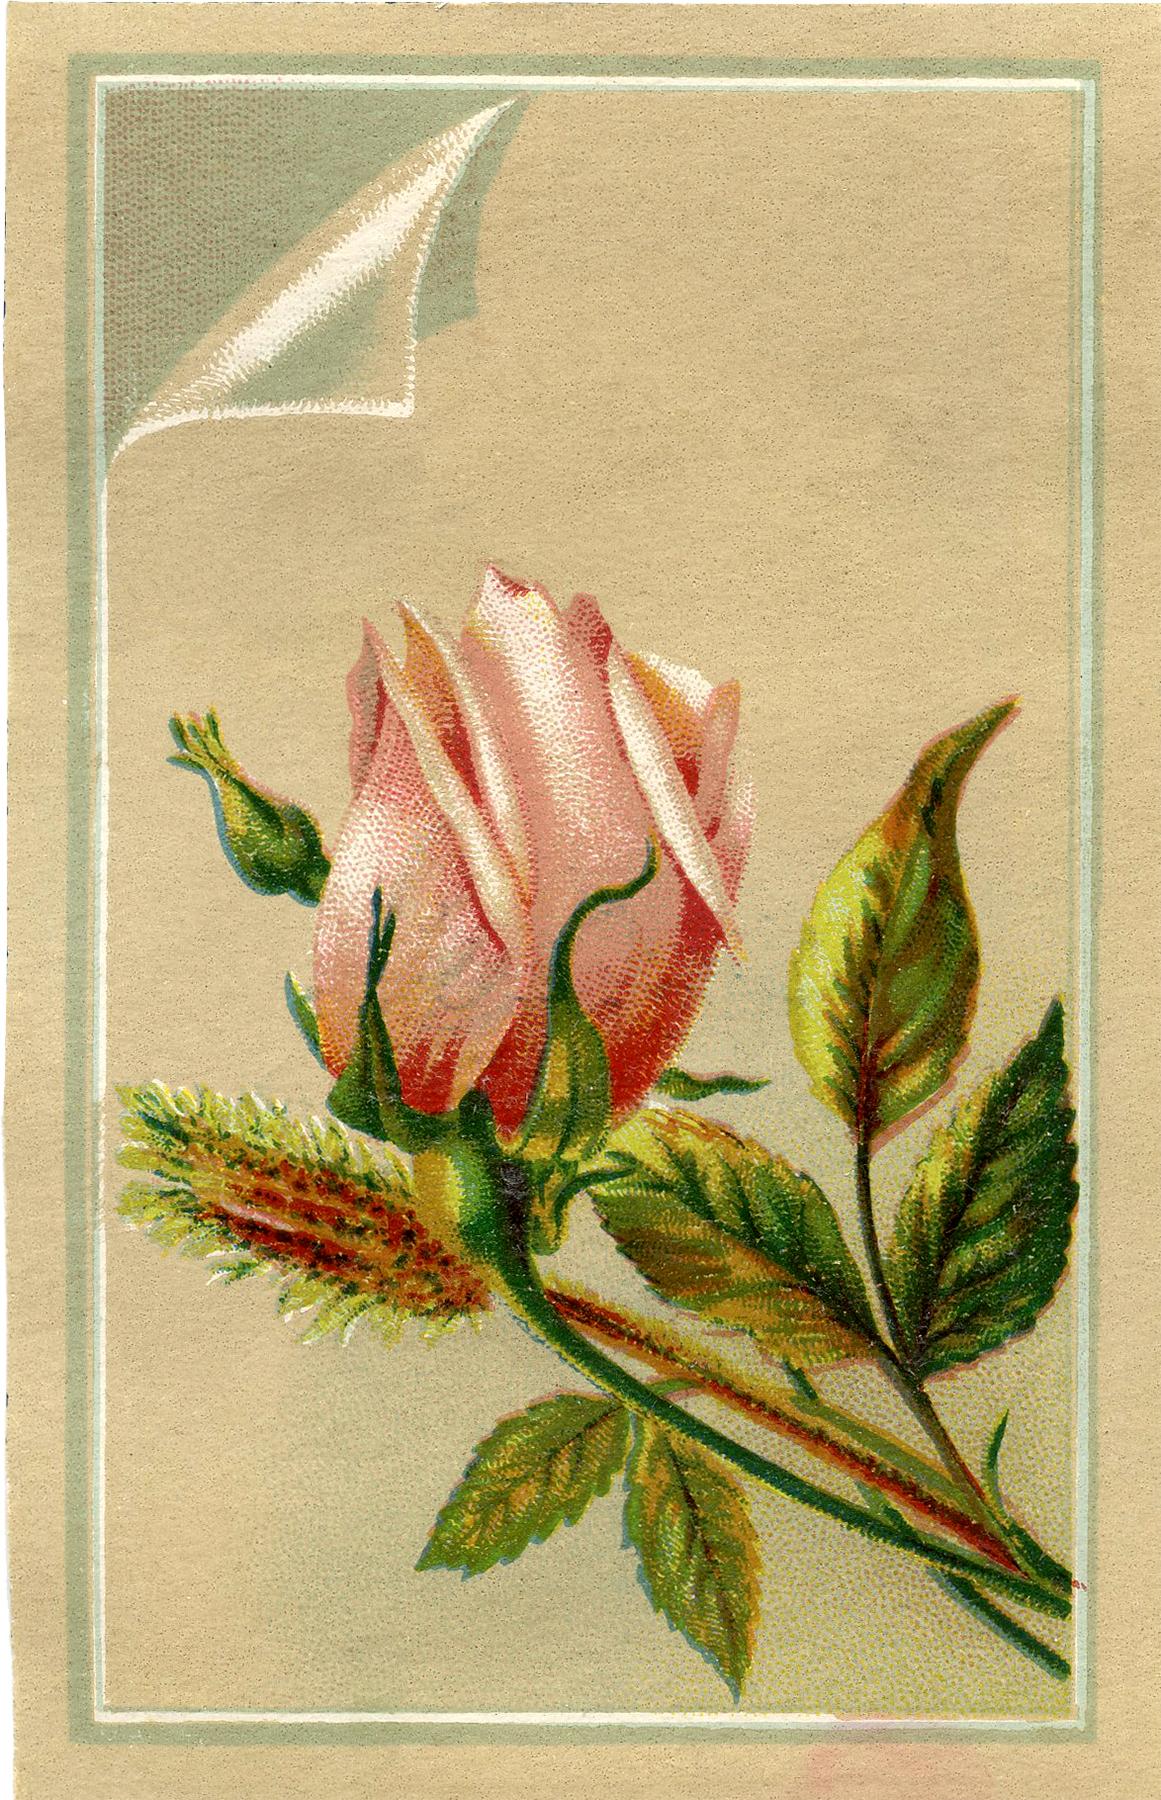 Free Vintage Rosebud Image The Graphics Fairy